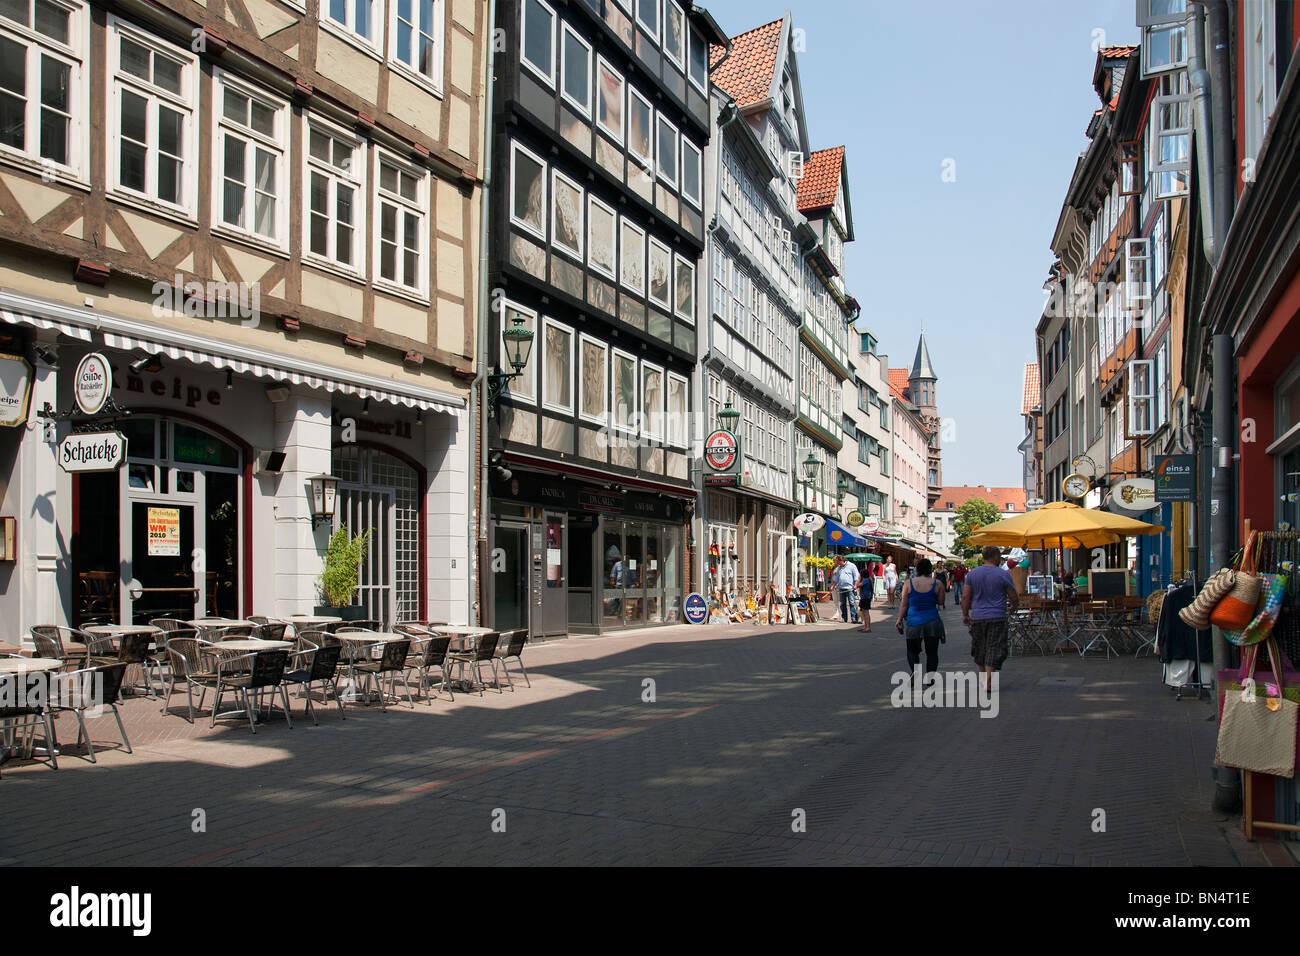 Altstadt, Kramerstrasse, Hannover, Lower Saxony, Germany - Stock Image